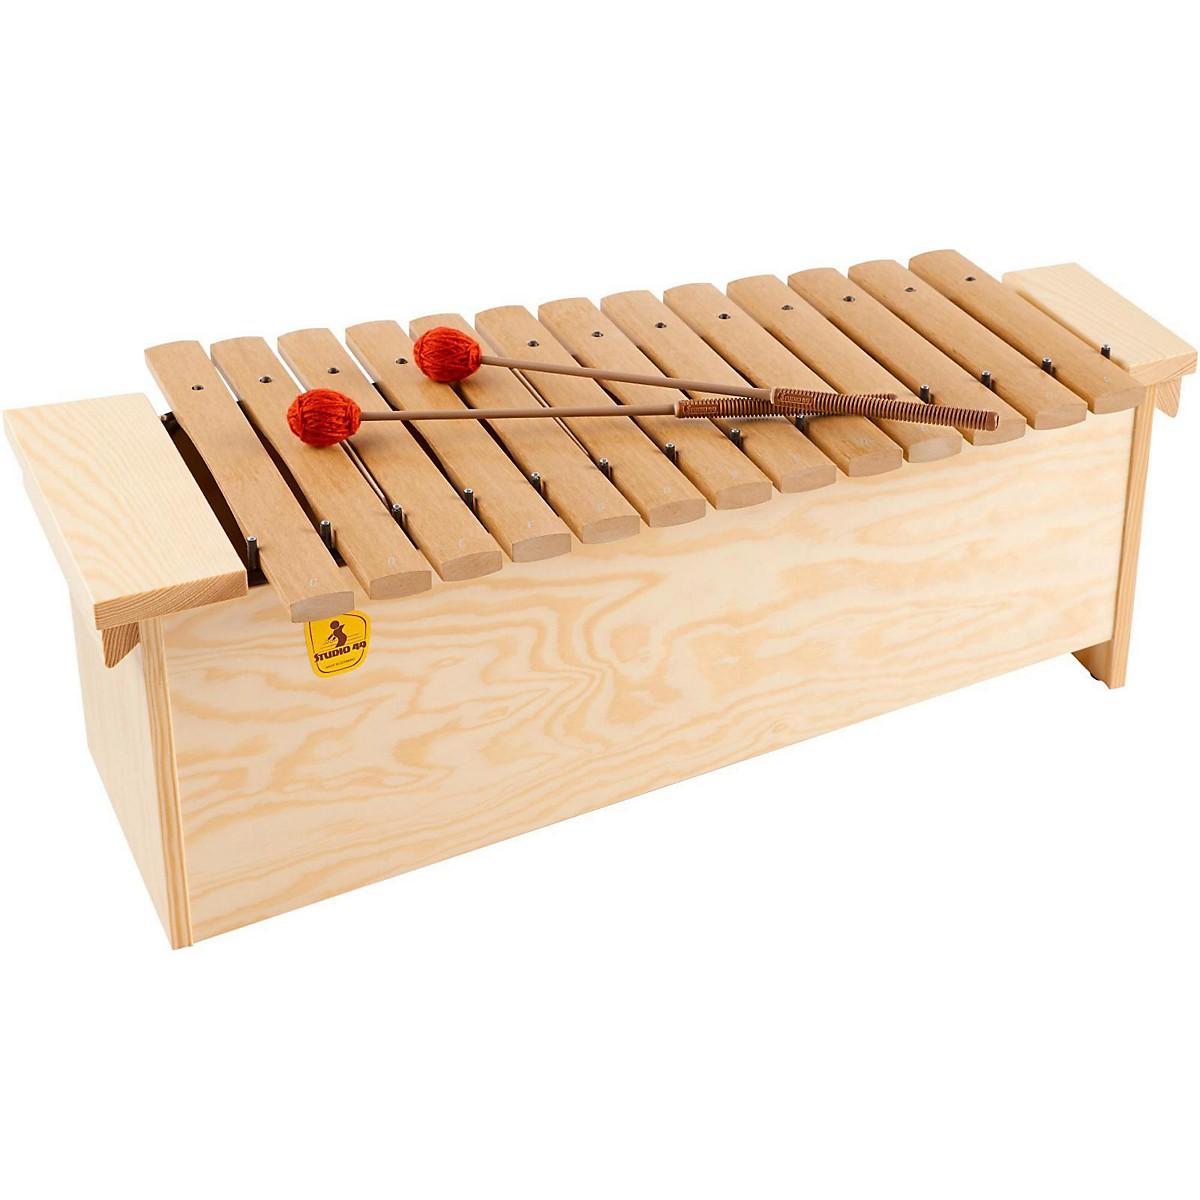 Studio 49 Diatonic Grillodur Xylophone